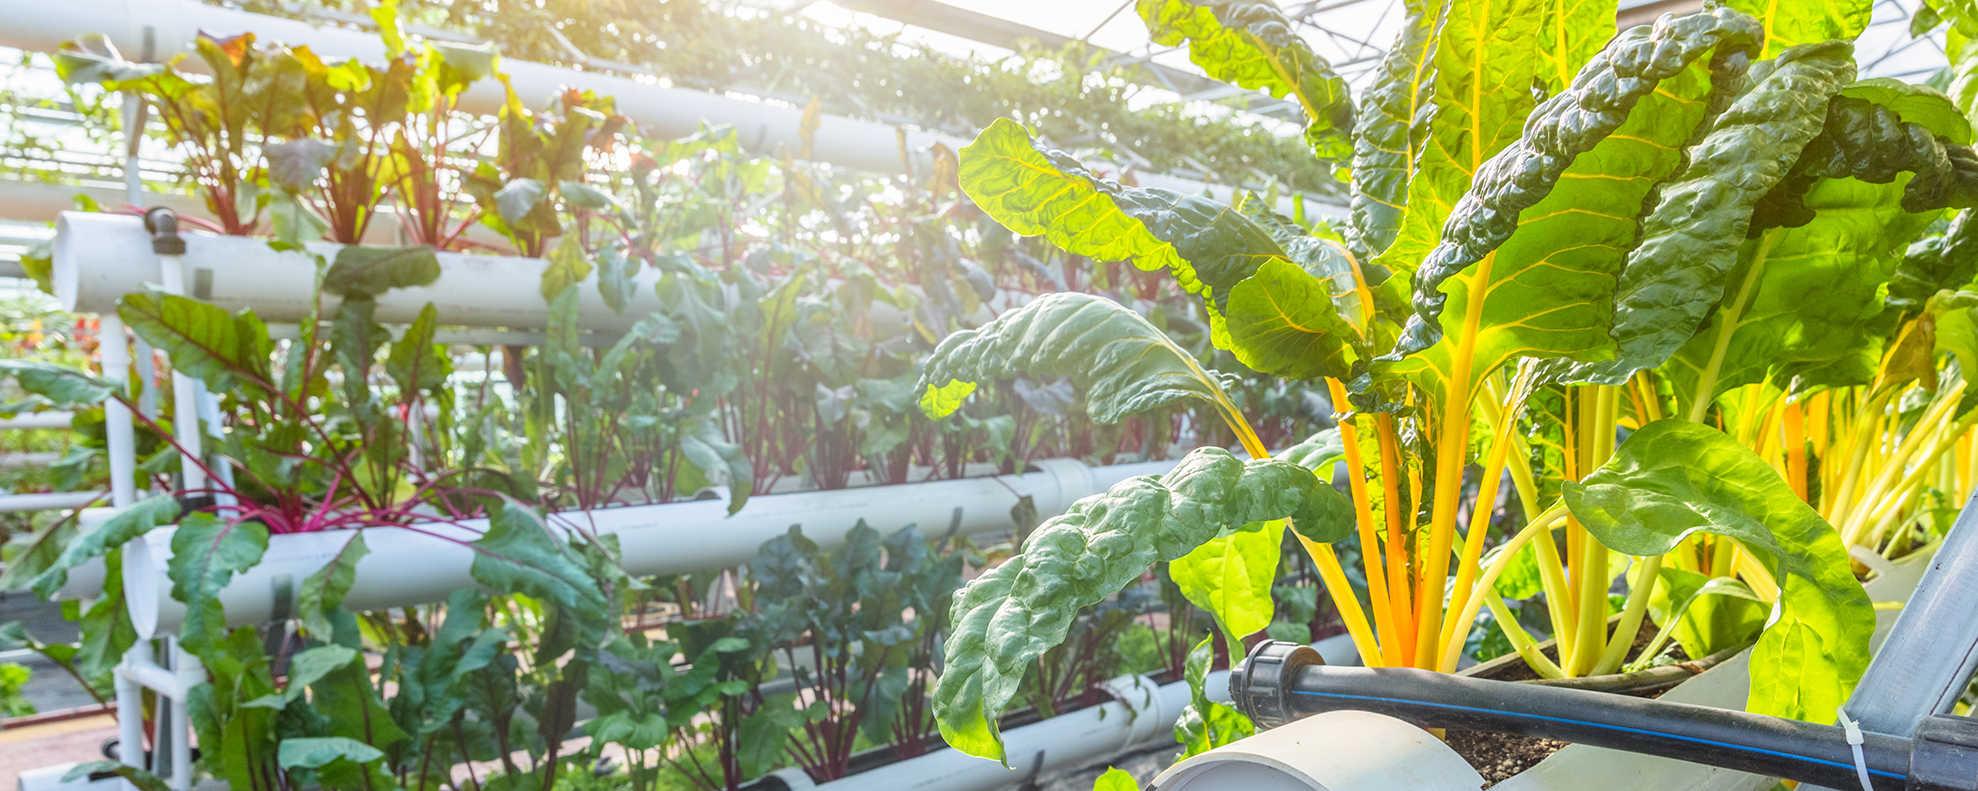 Organic Swiss chard grown vertically